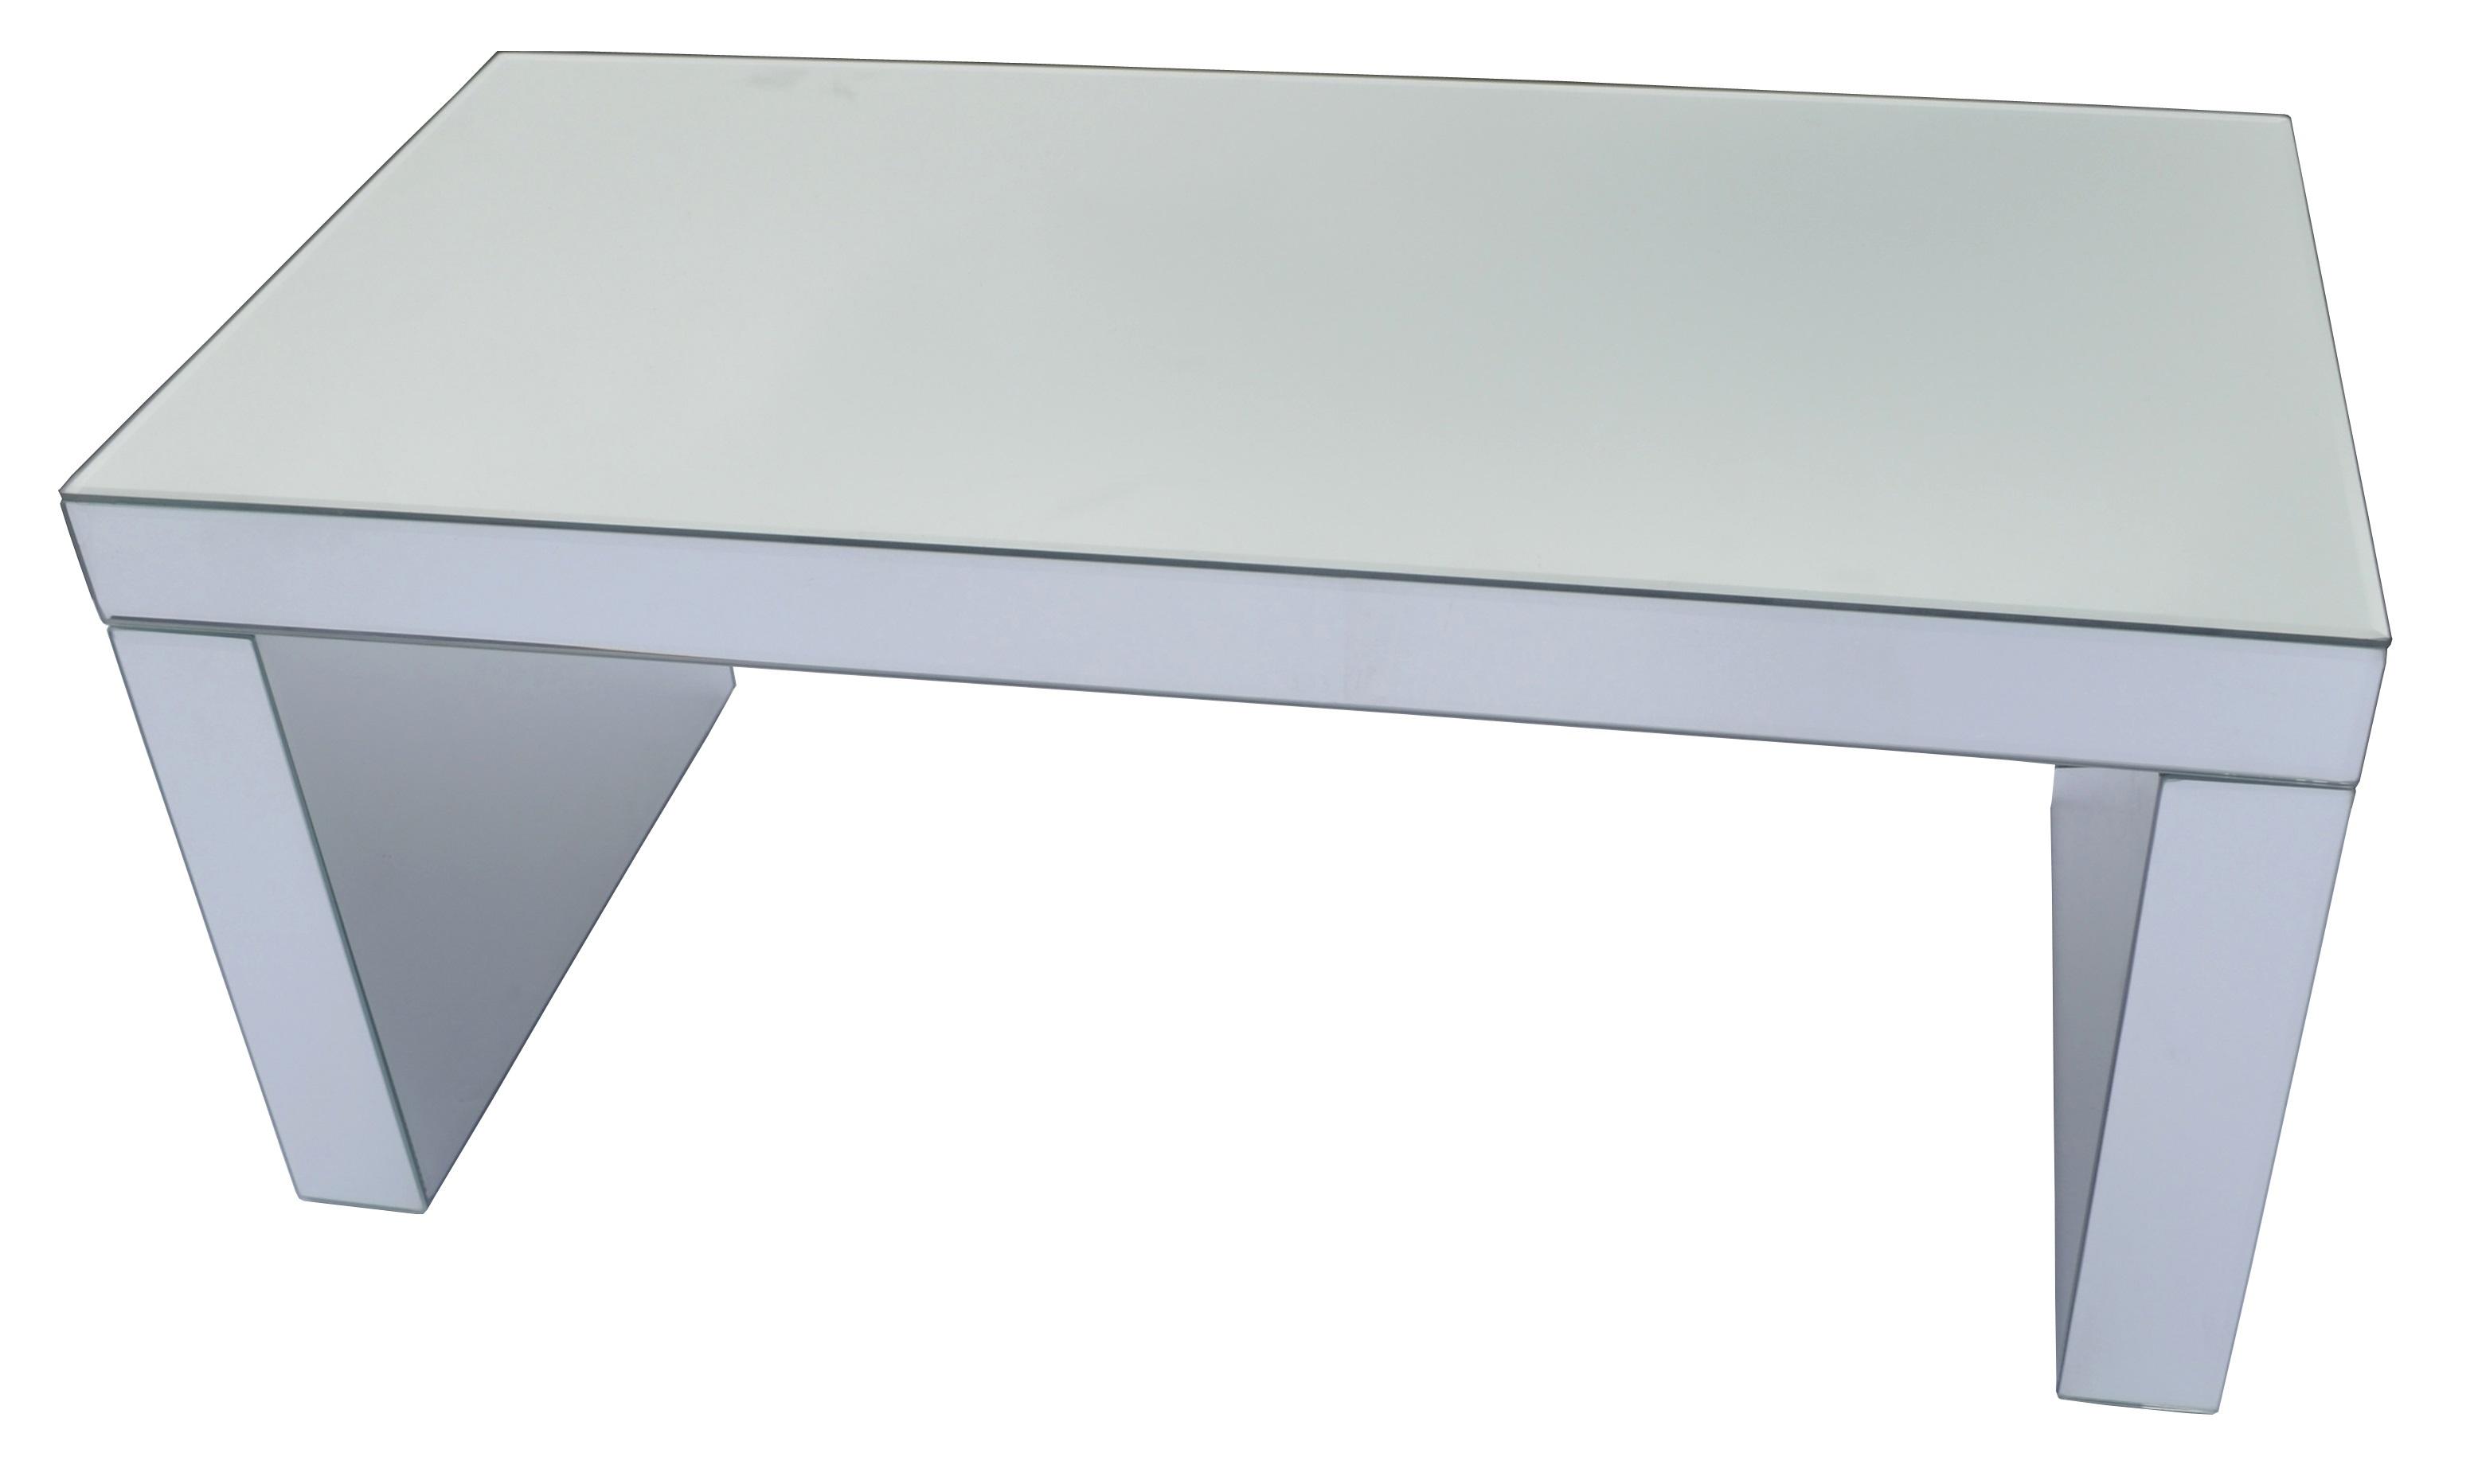 Mirrored Coffee Table Mirror Furniture  Z2584